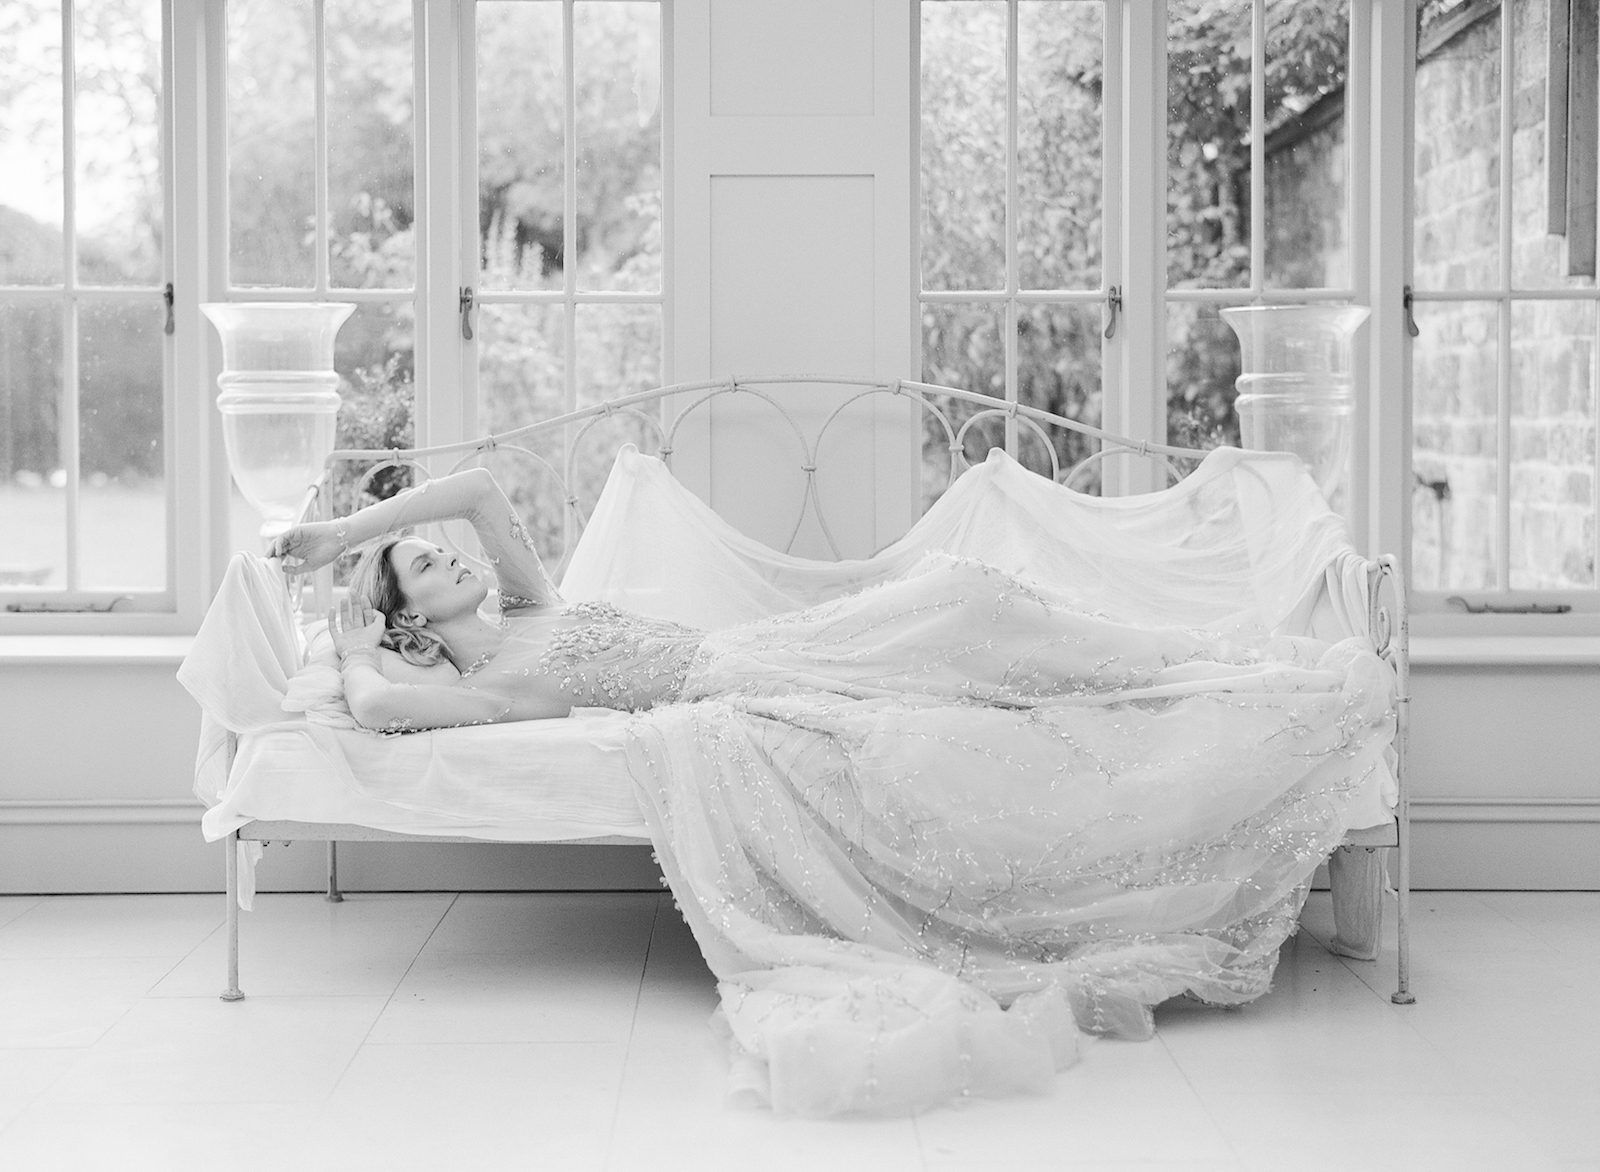 Luxury Wedding Planner UK, London & Europe | A Feminine & Refined Autumn Wedding Inspiration | English Manor Country Autumn Wedding Moody Romantic Warm Velvet Black Red and Peach Tones | Molly Carr Photography160.JPG